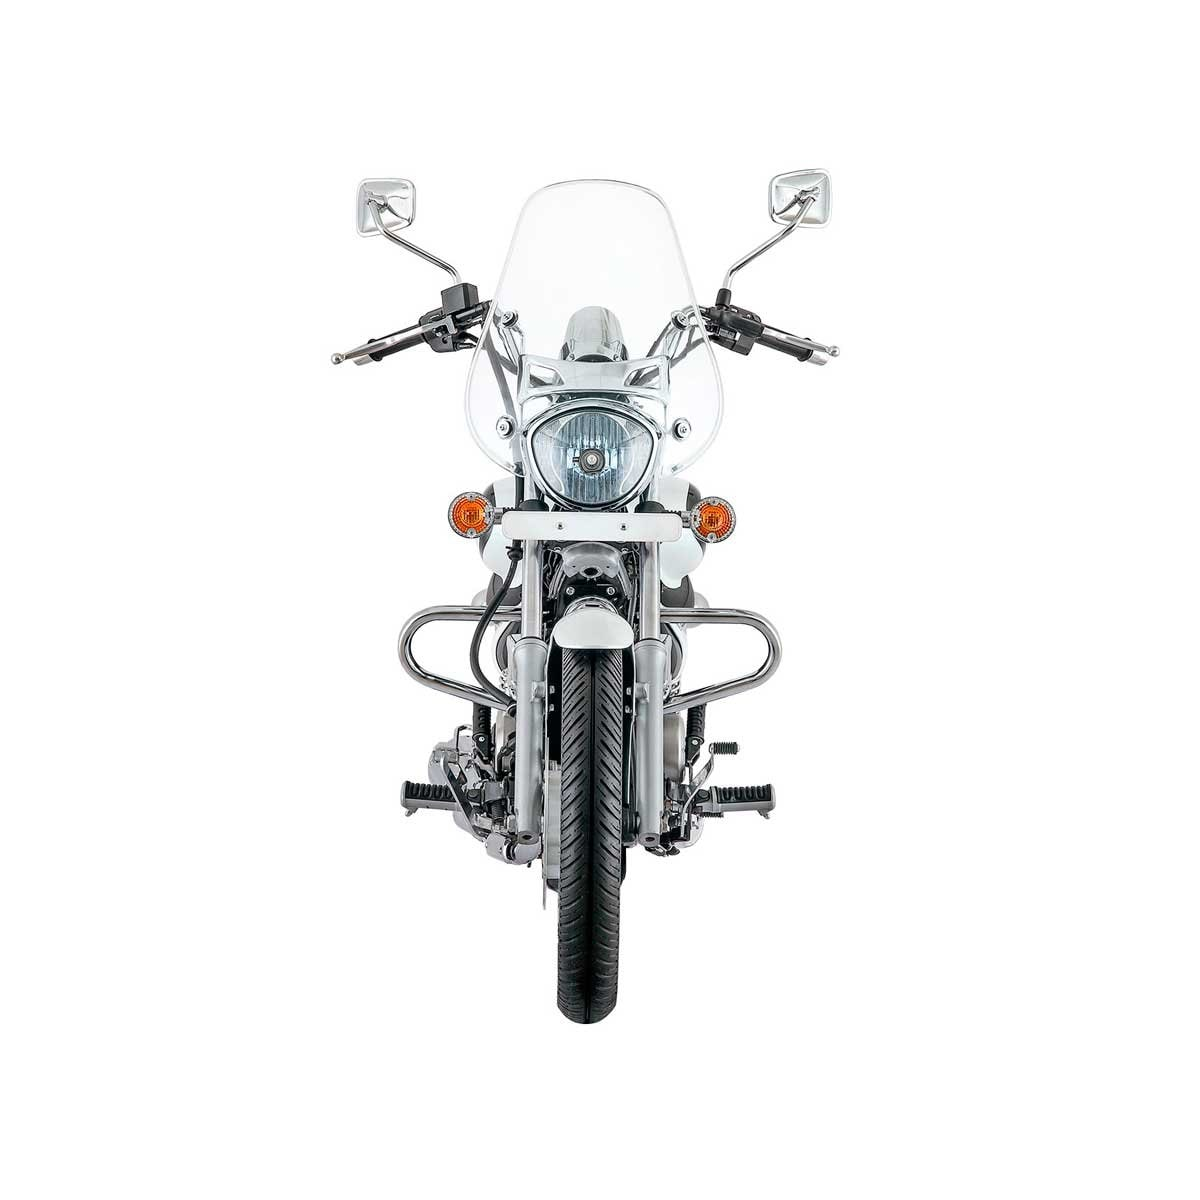 Motocicleta Avenger 220 Cc Cruise Negra Bajaj